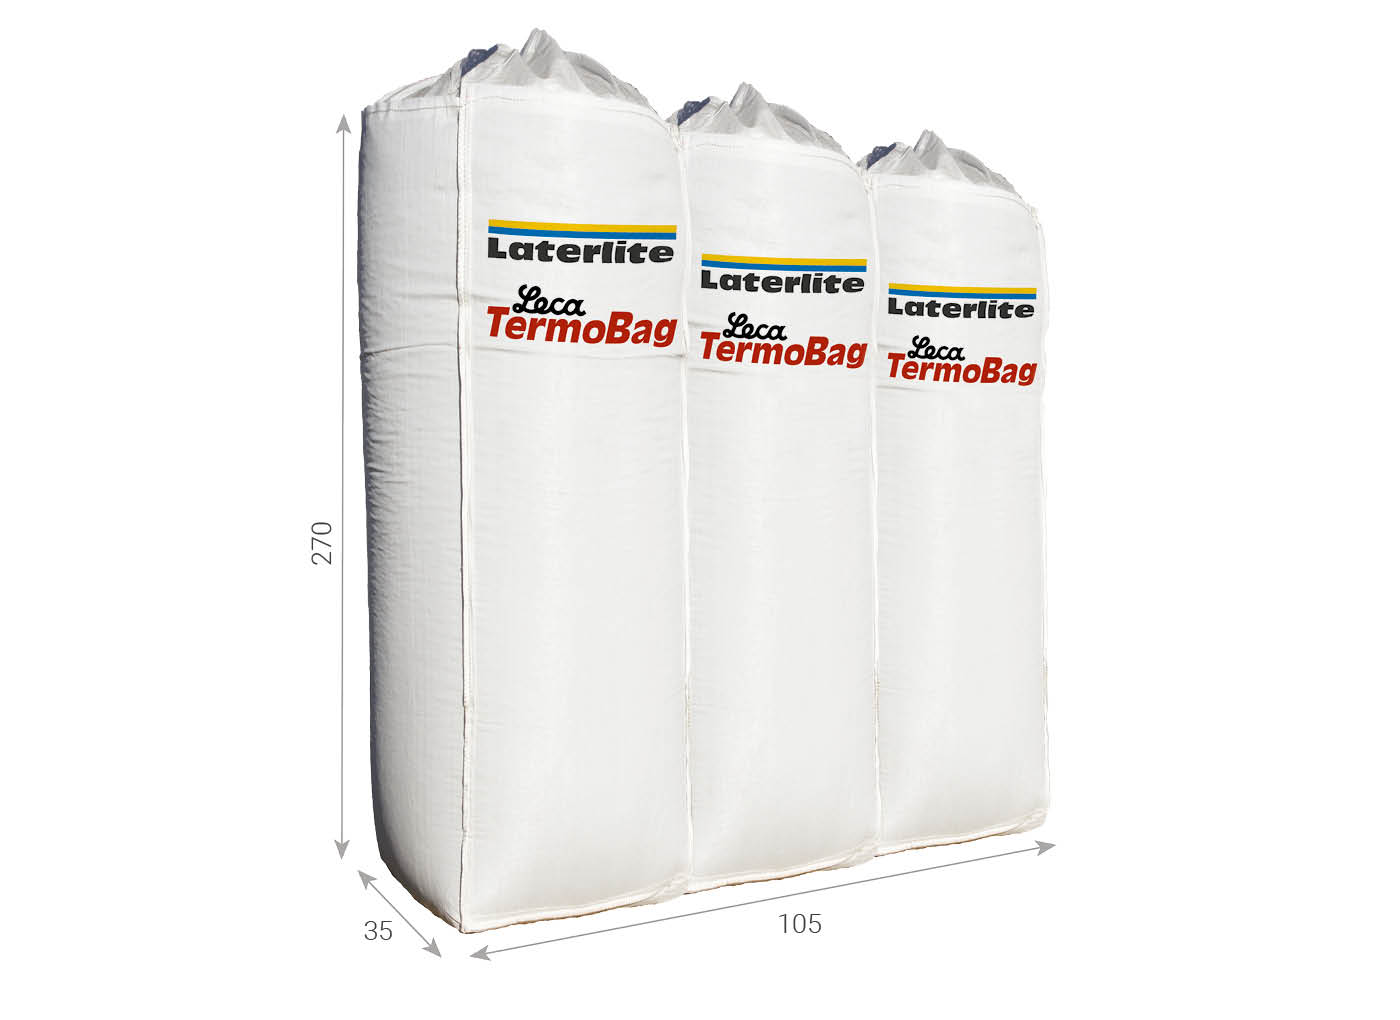 sacconi-Termobag-isolamento-pareti-interrate-P4-1